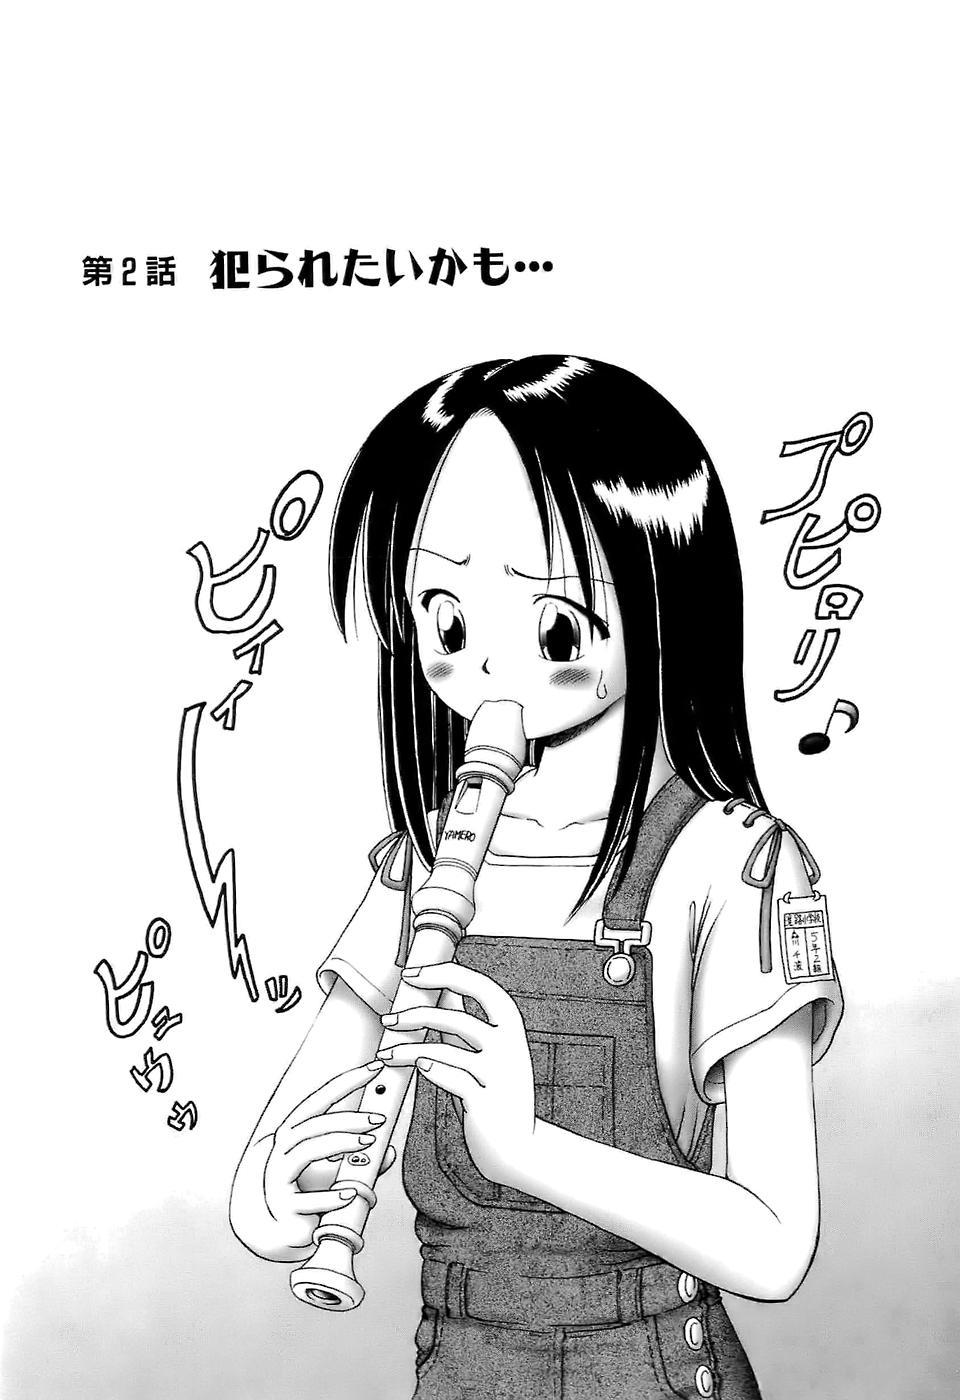 [Bow Rei] Osanai Kajitsu -Inkou Shougakusei no Houkago- Jou 44